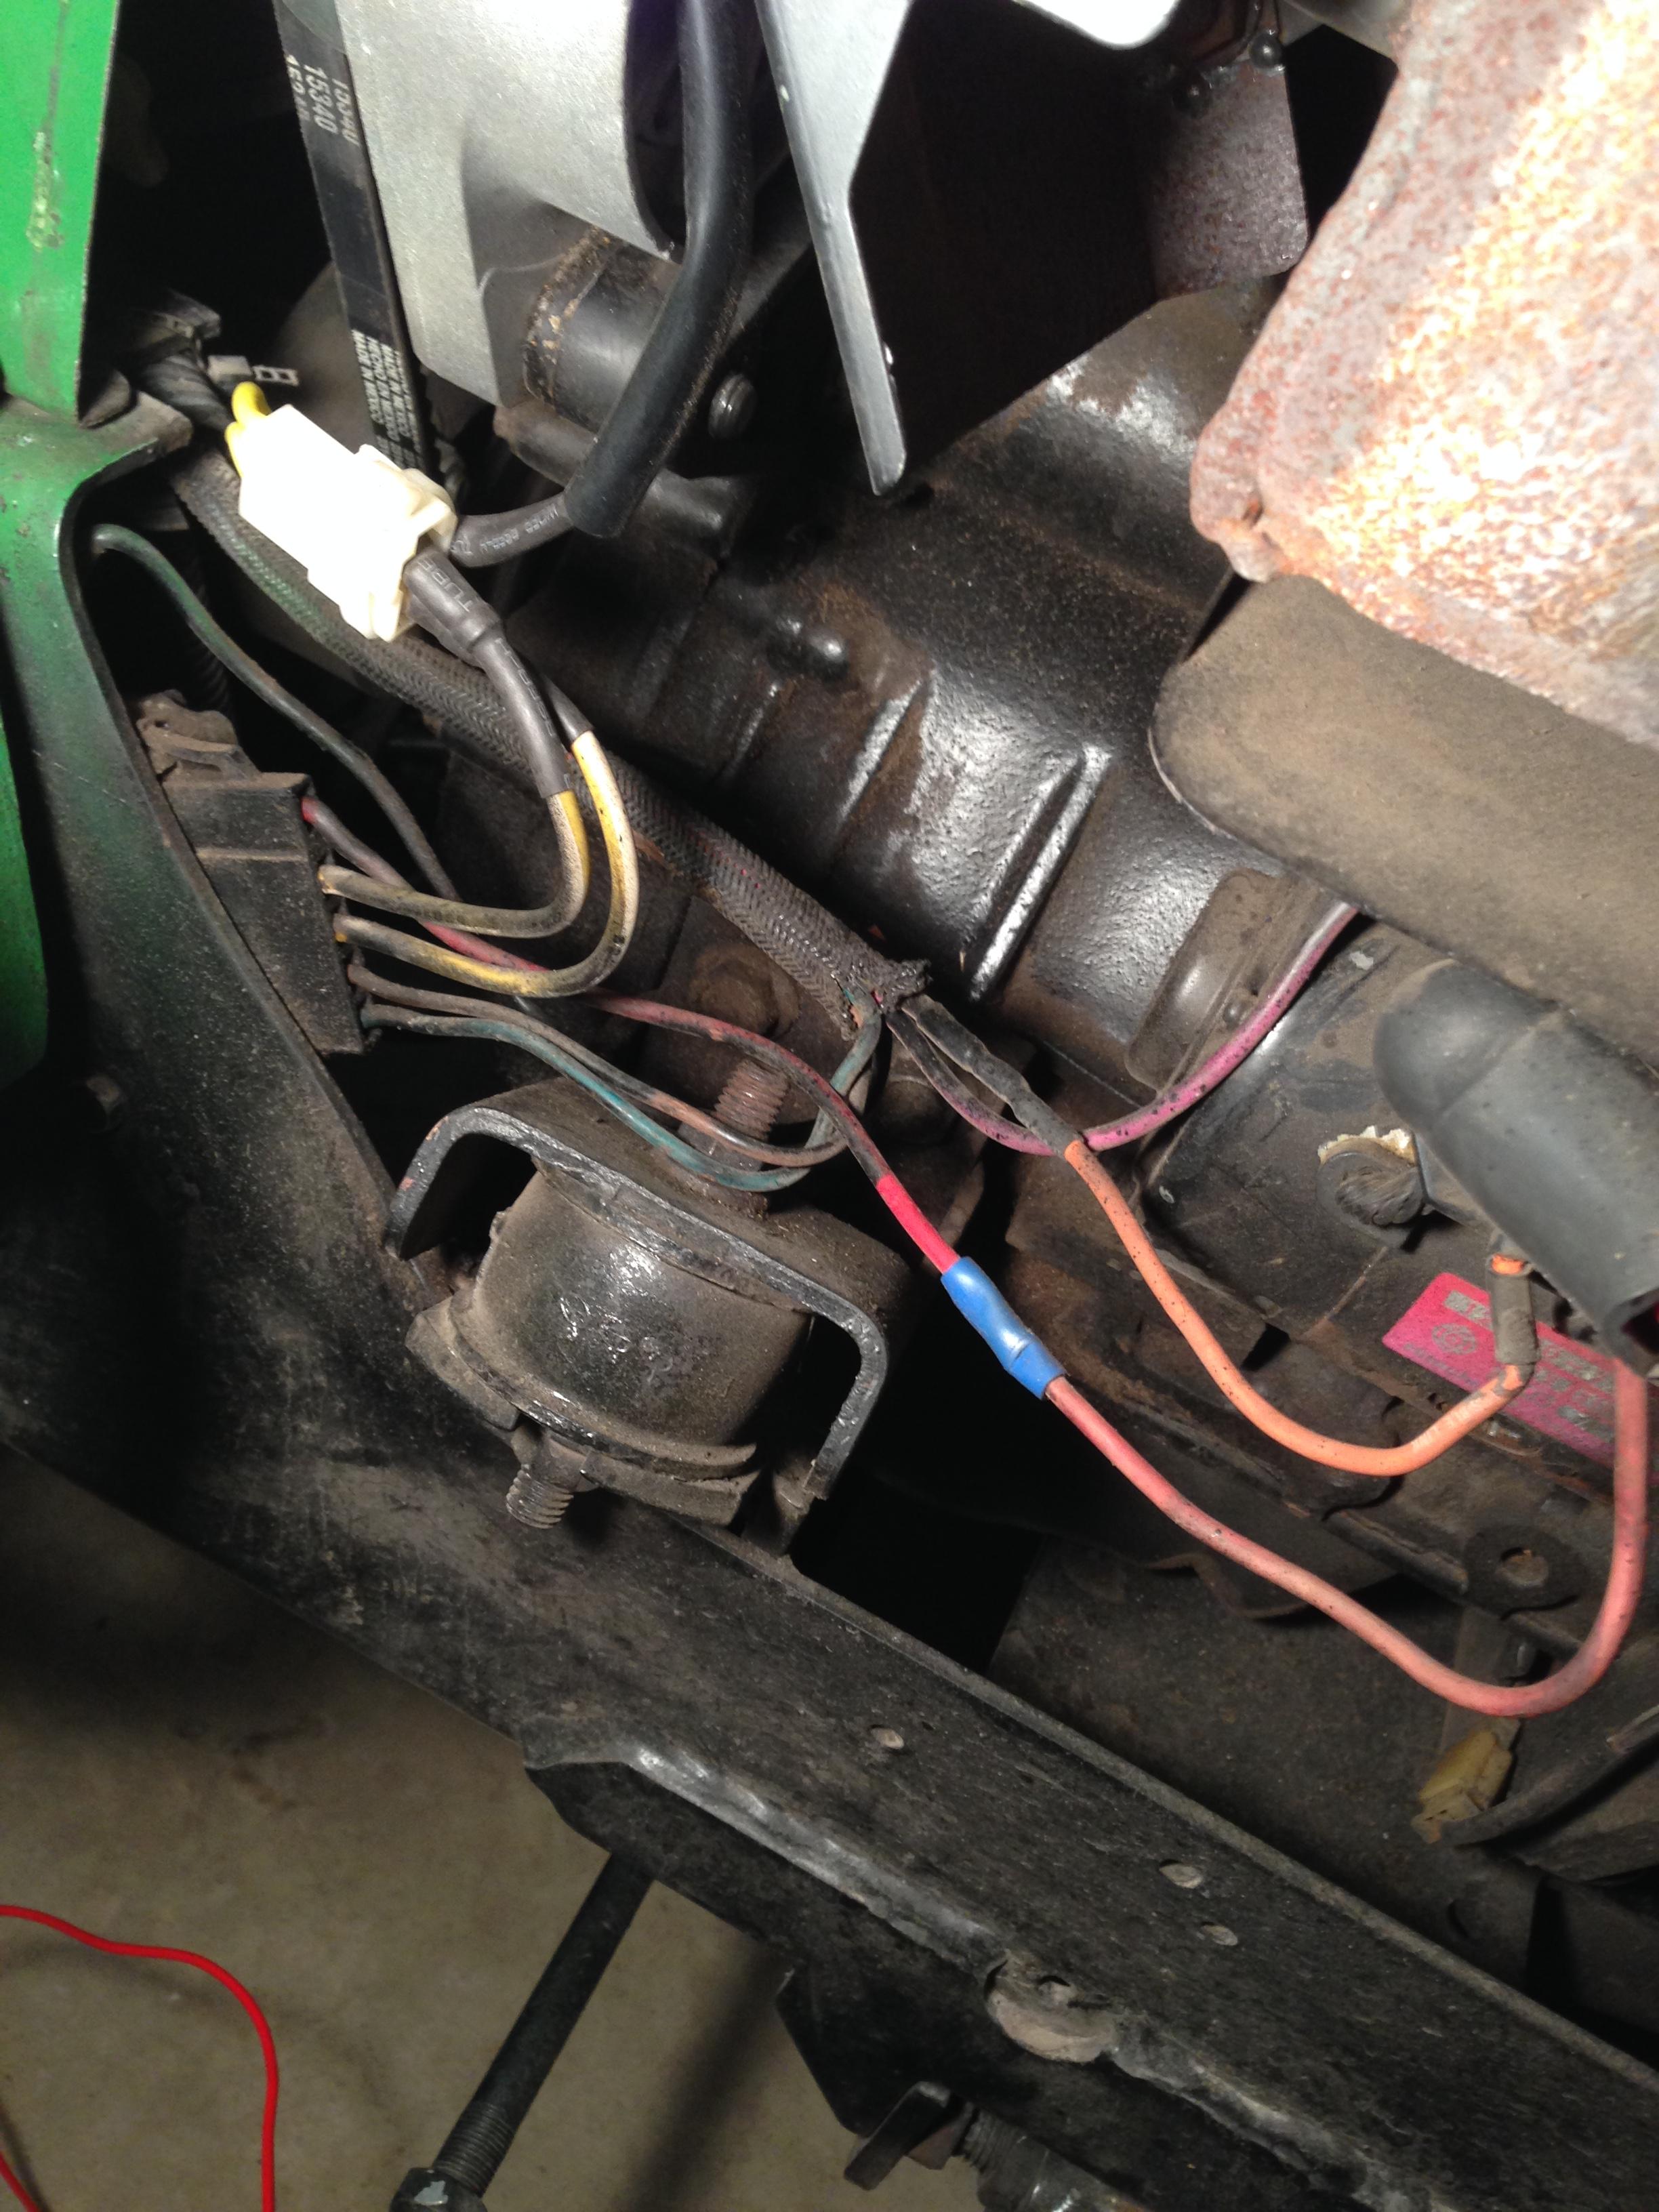 John Deere 330 Alternator Wiring John Tractor Engine And Wiring – John Deere 322 Wiring-diagram